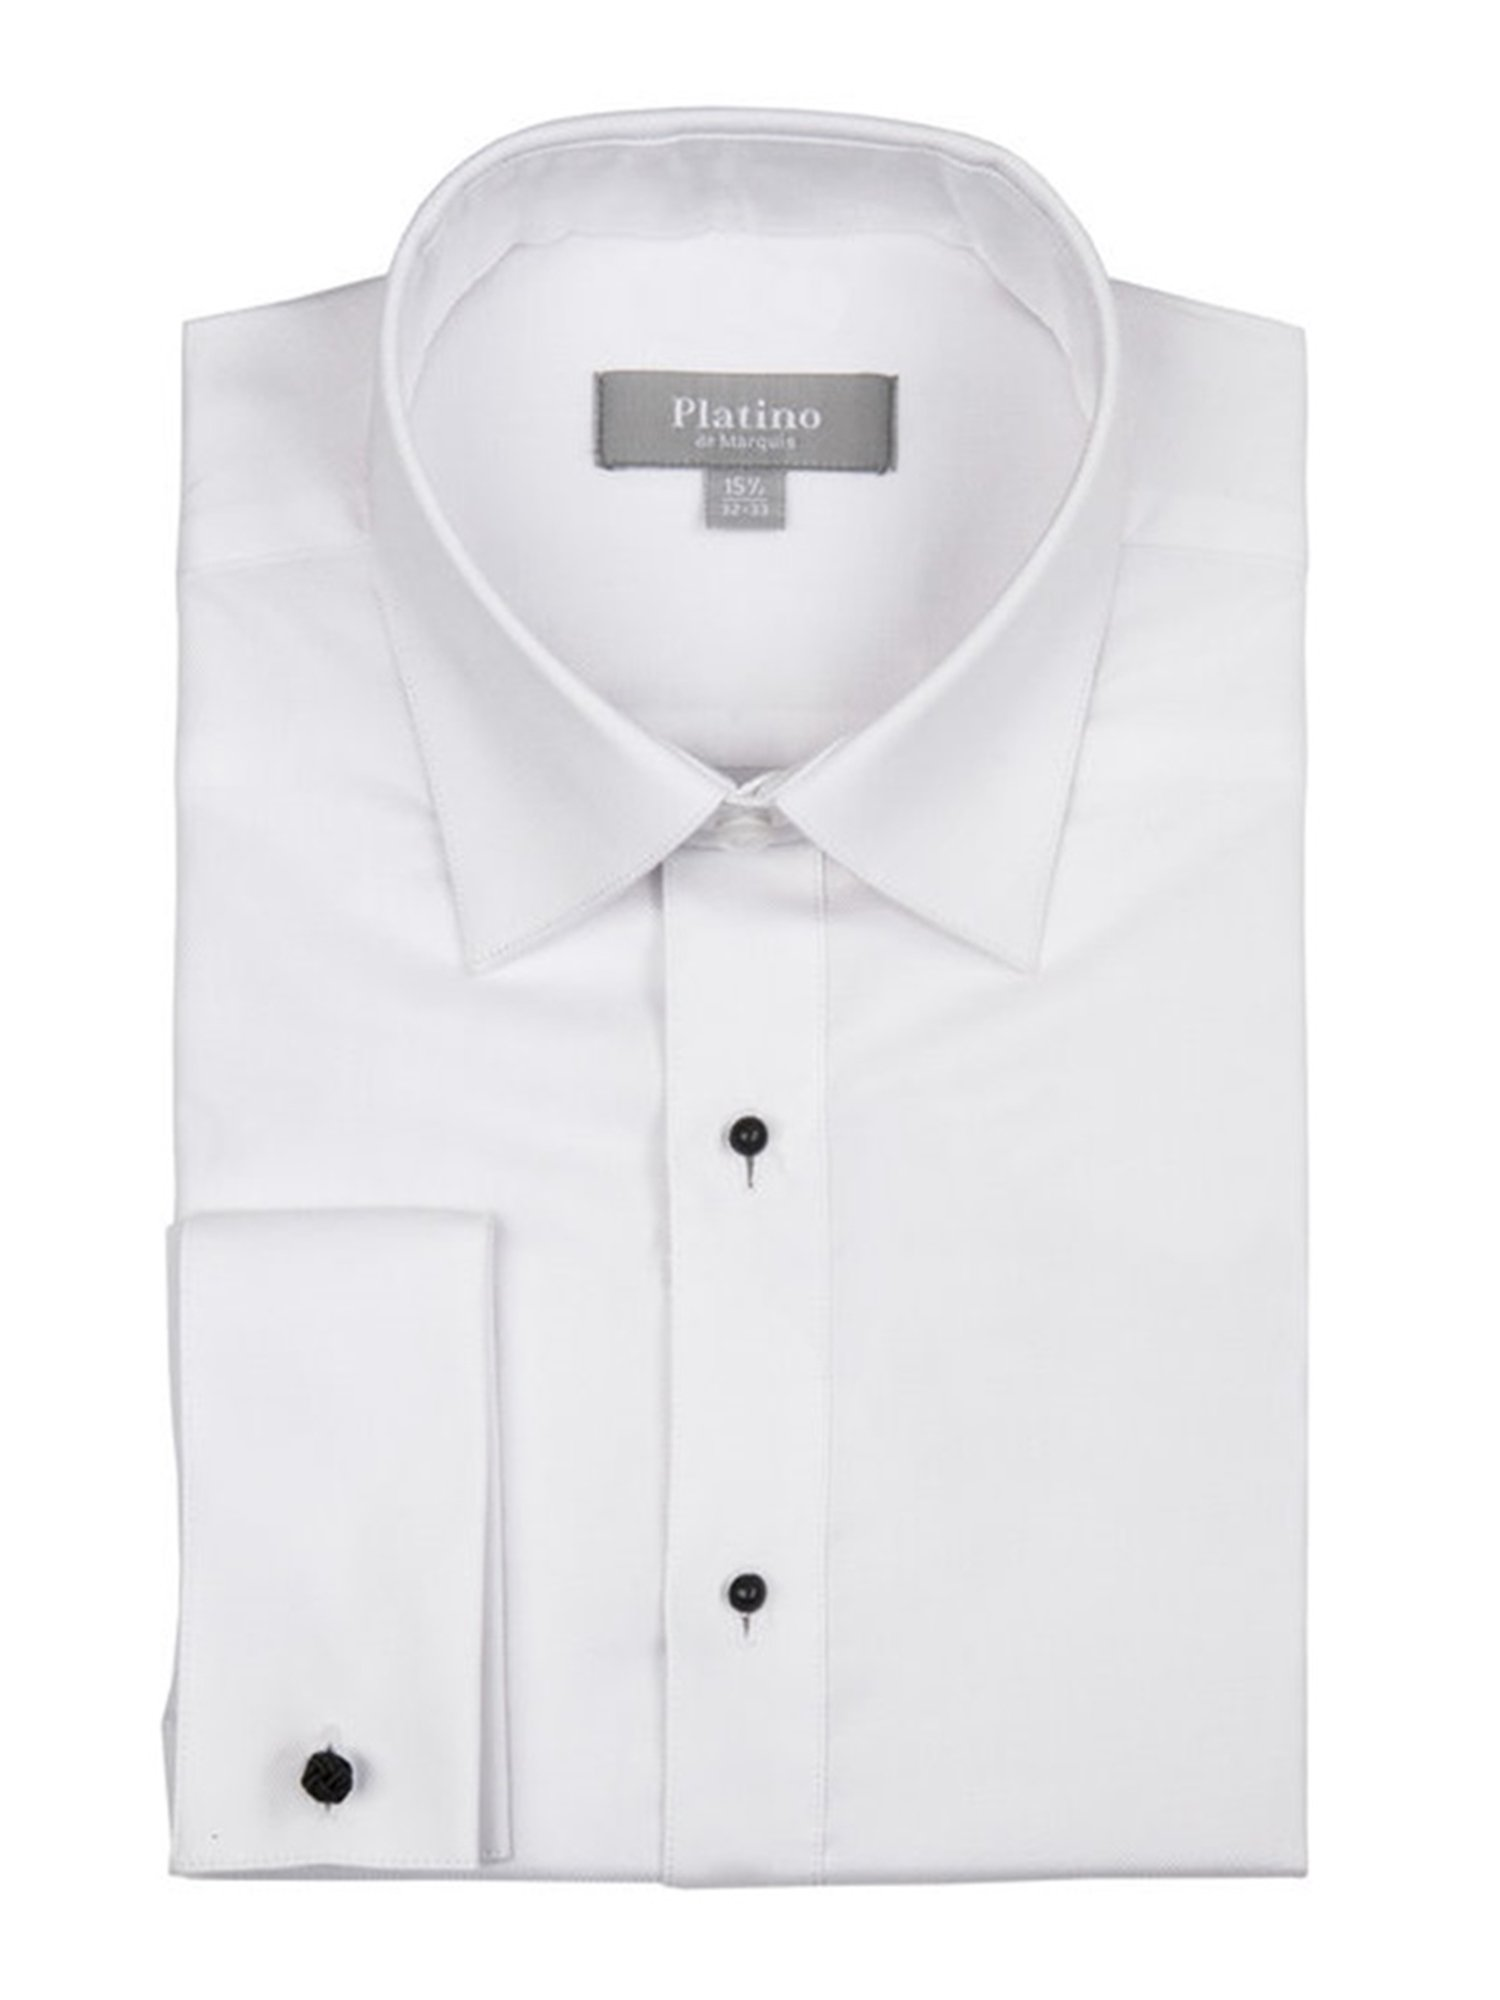 Marquis Platino Men's Textured Slim Fit French Cuff Laydown 100% Cotton Tuxedo Shirt